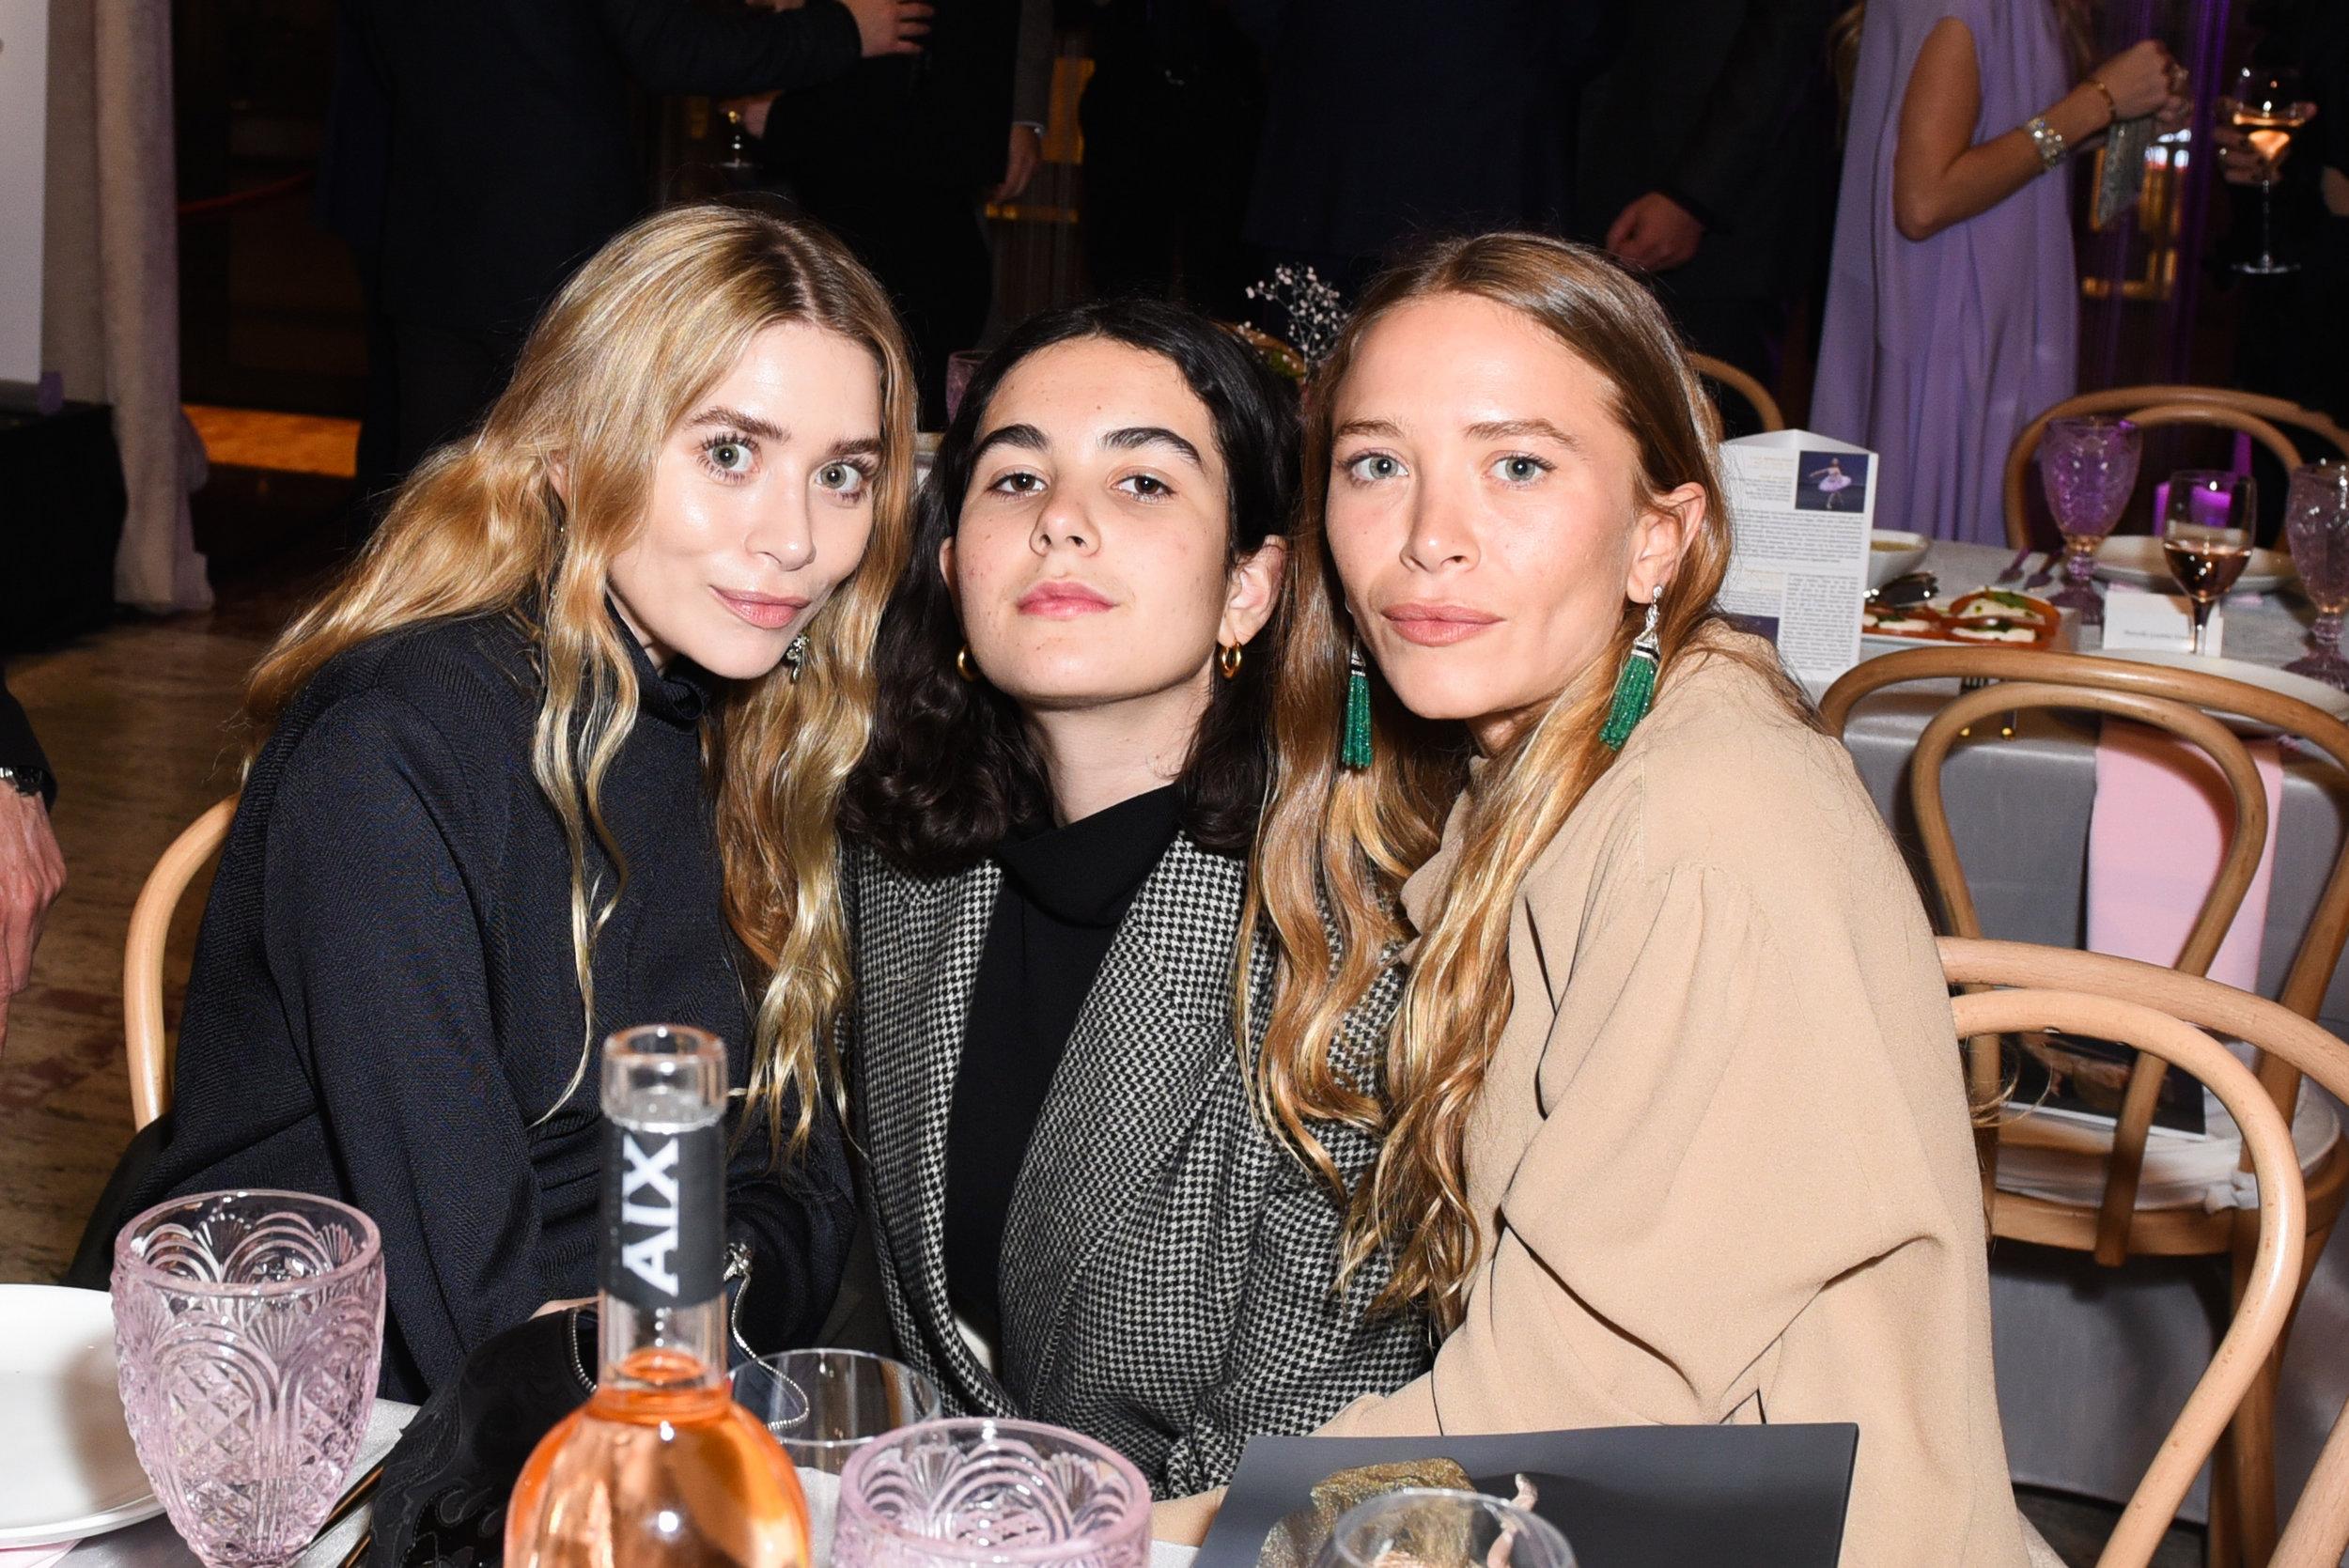 Ashley Olsen, Margot Sarkozy, Mary-Kate Olsen by Presley Ann for PMC.JPG